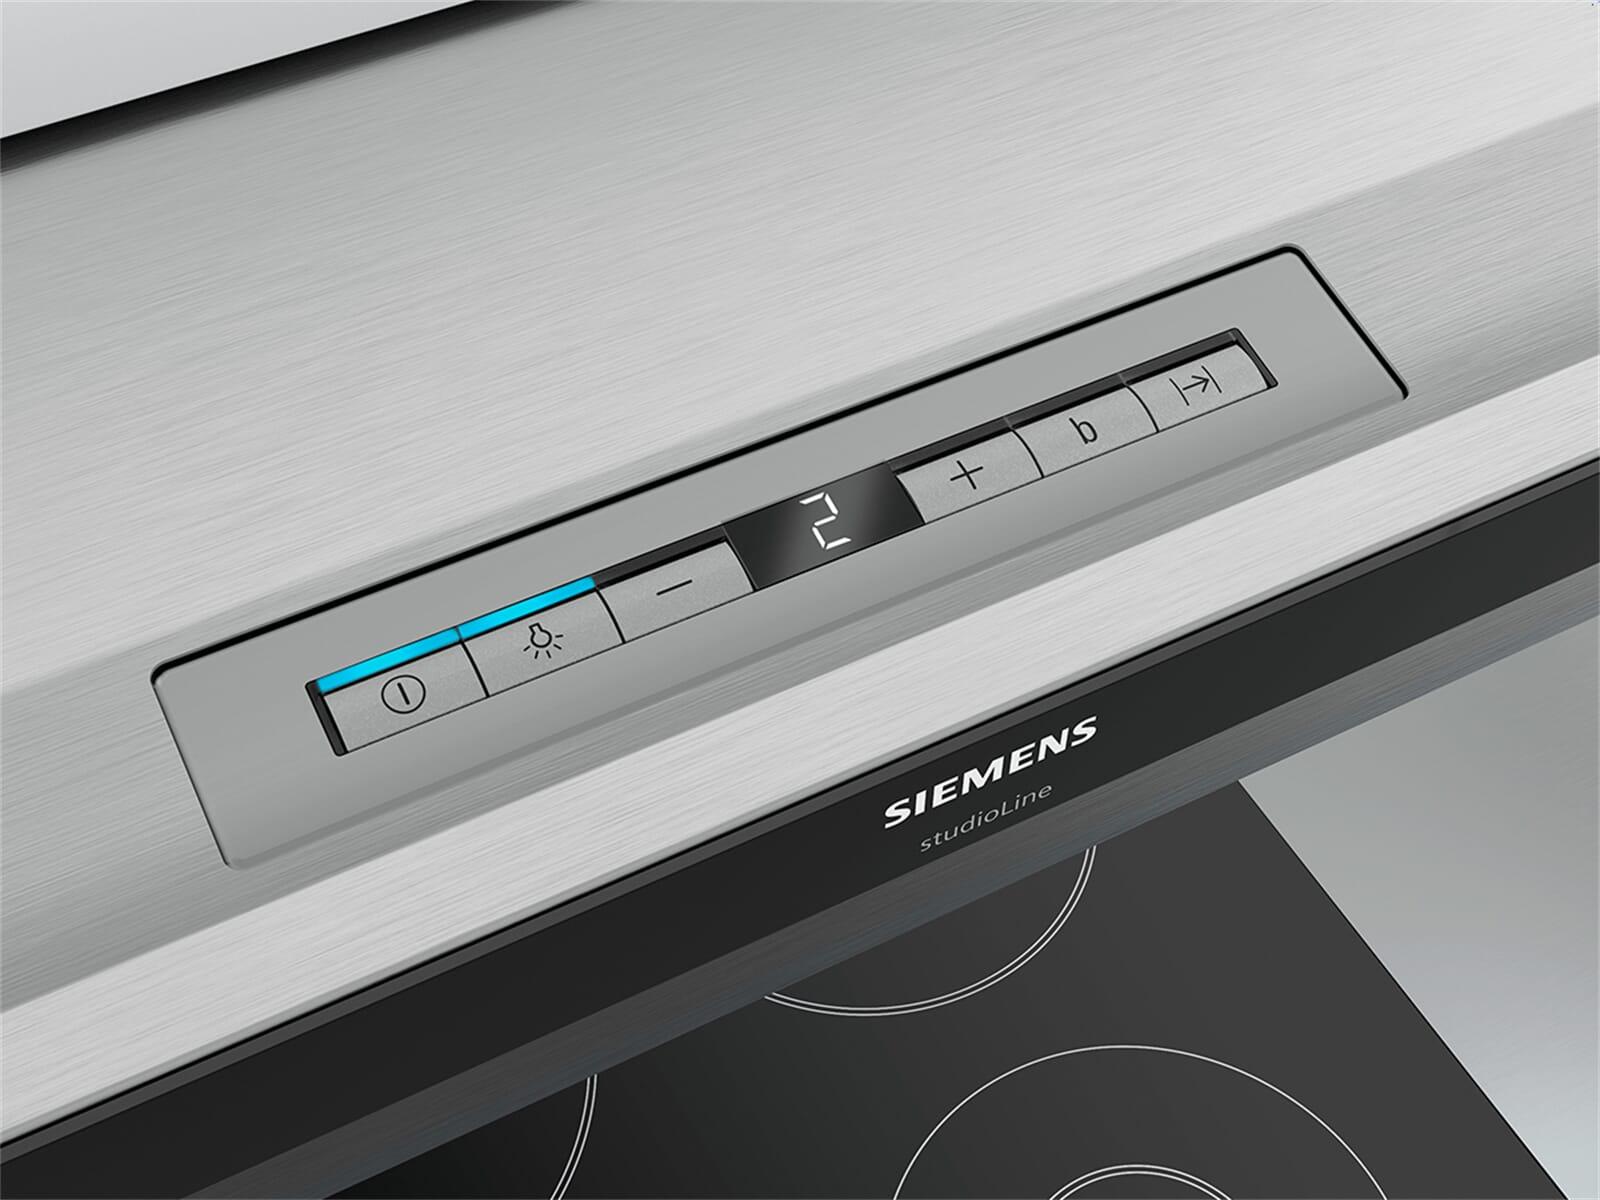 Siemens studioLine LI67SA560S Flachschirmhaube Edelstahl